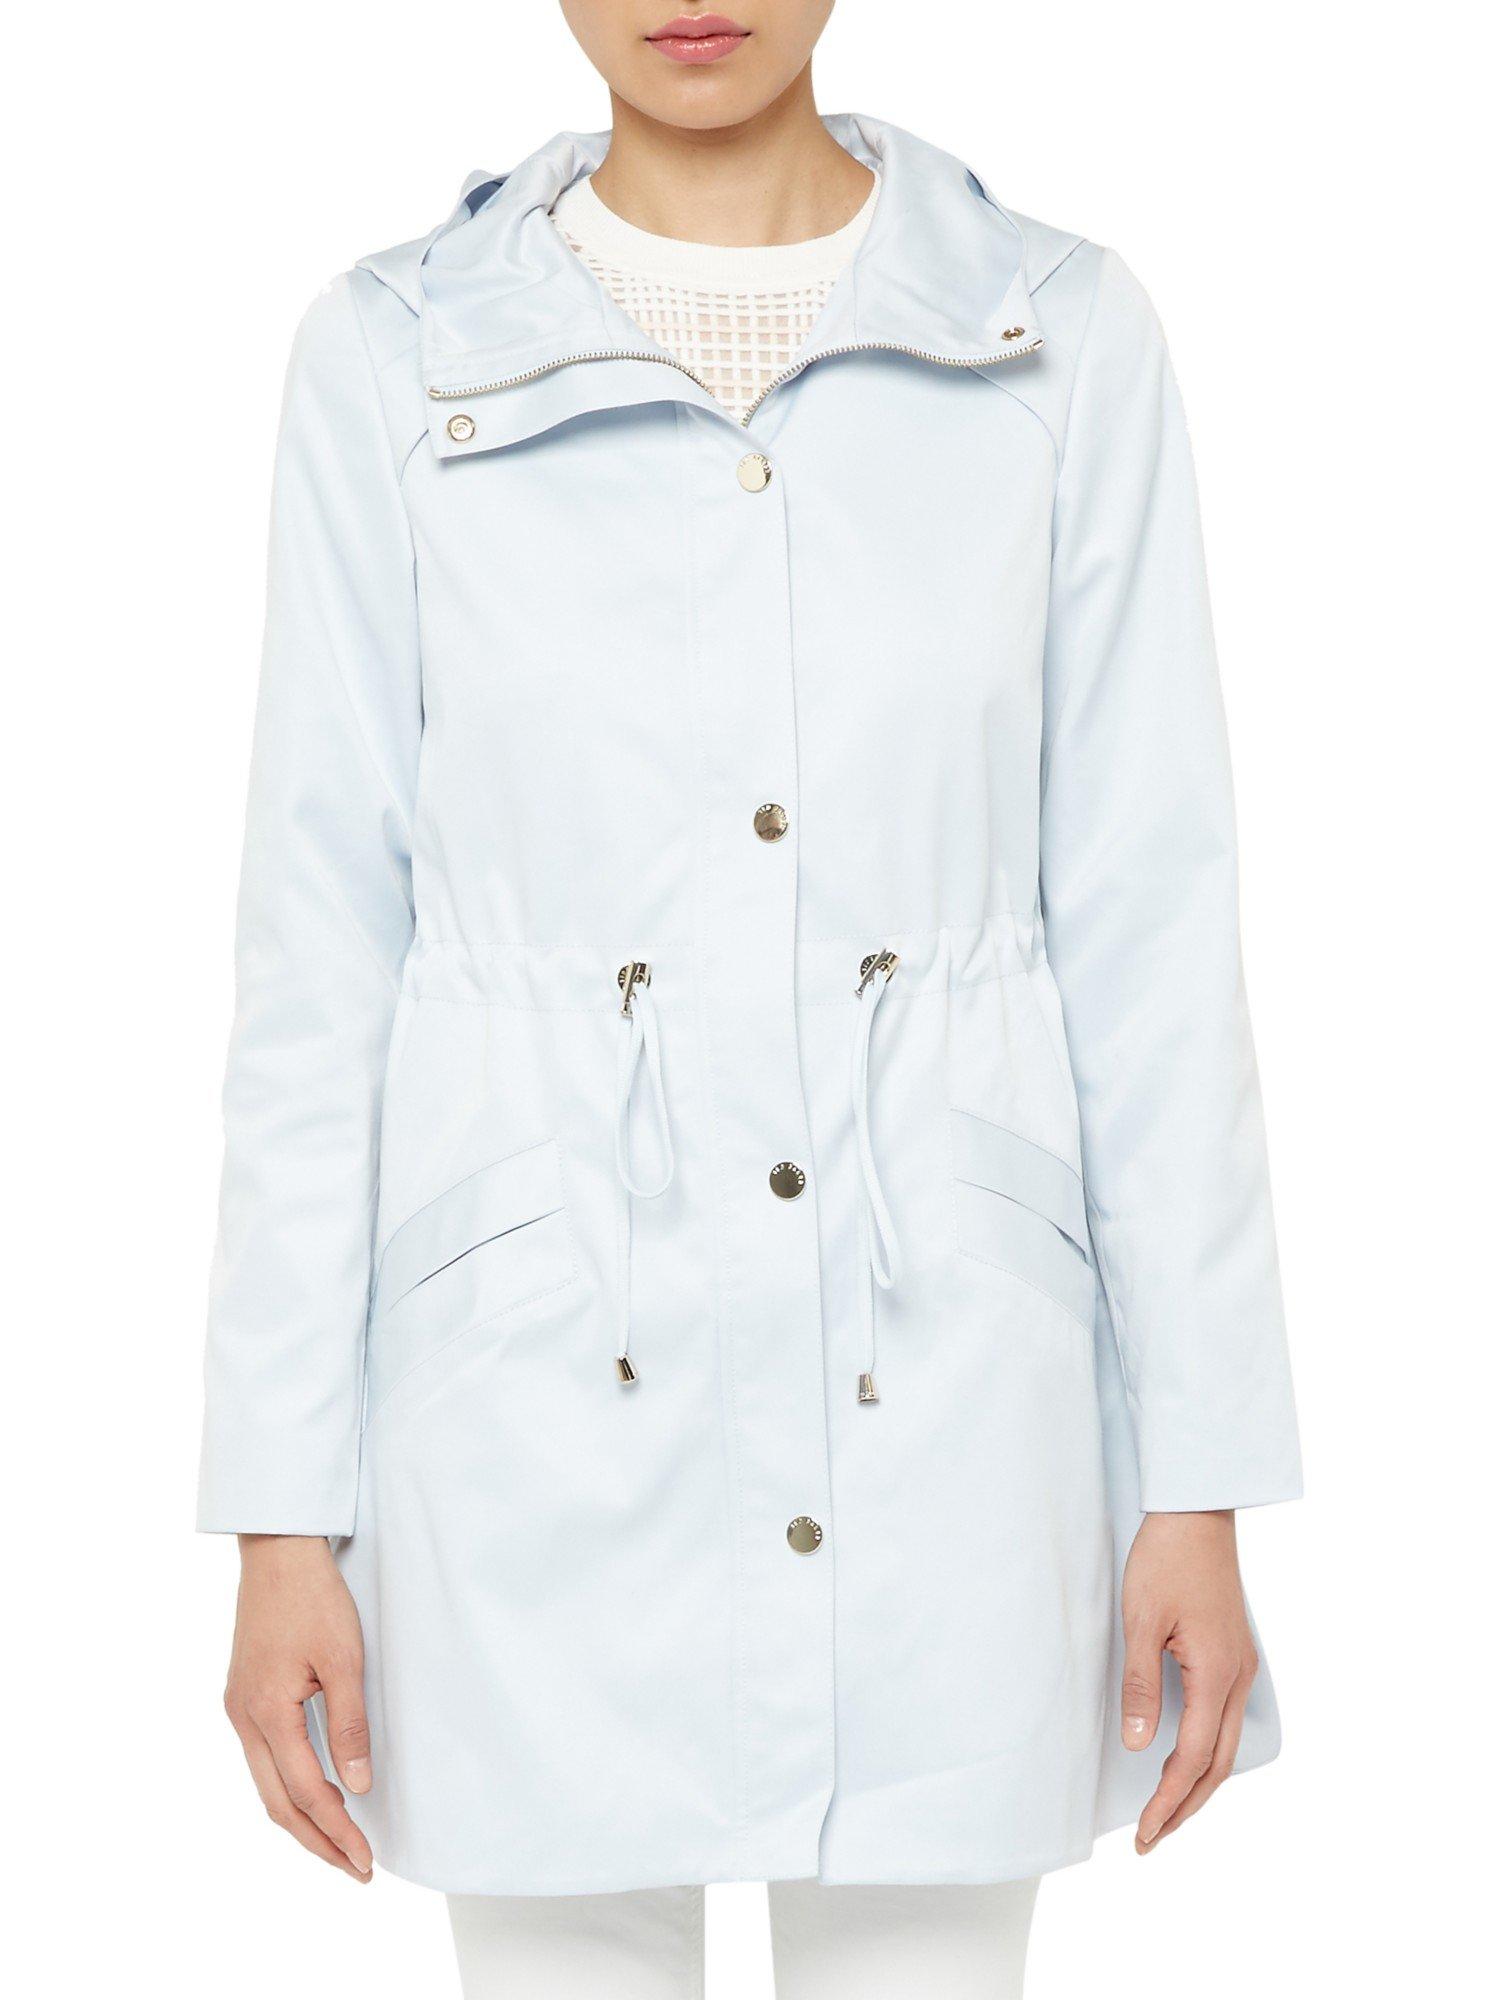 Ted baker Valeska Hooded Parka Jacket in Blue   Lyst